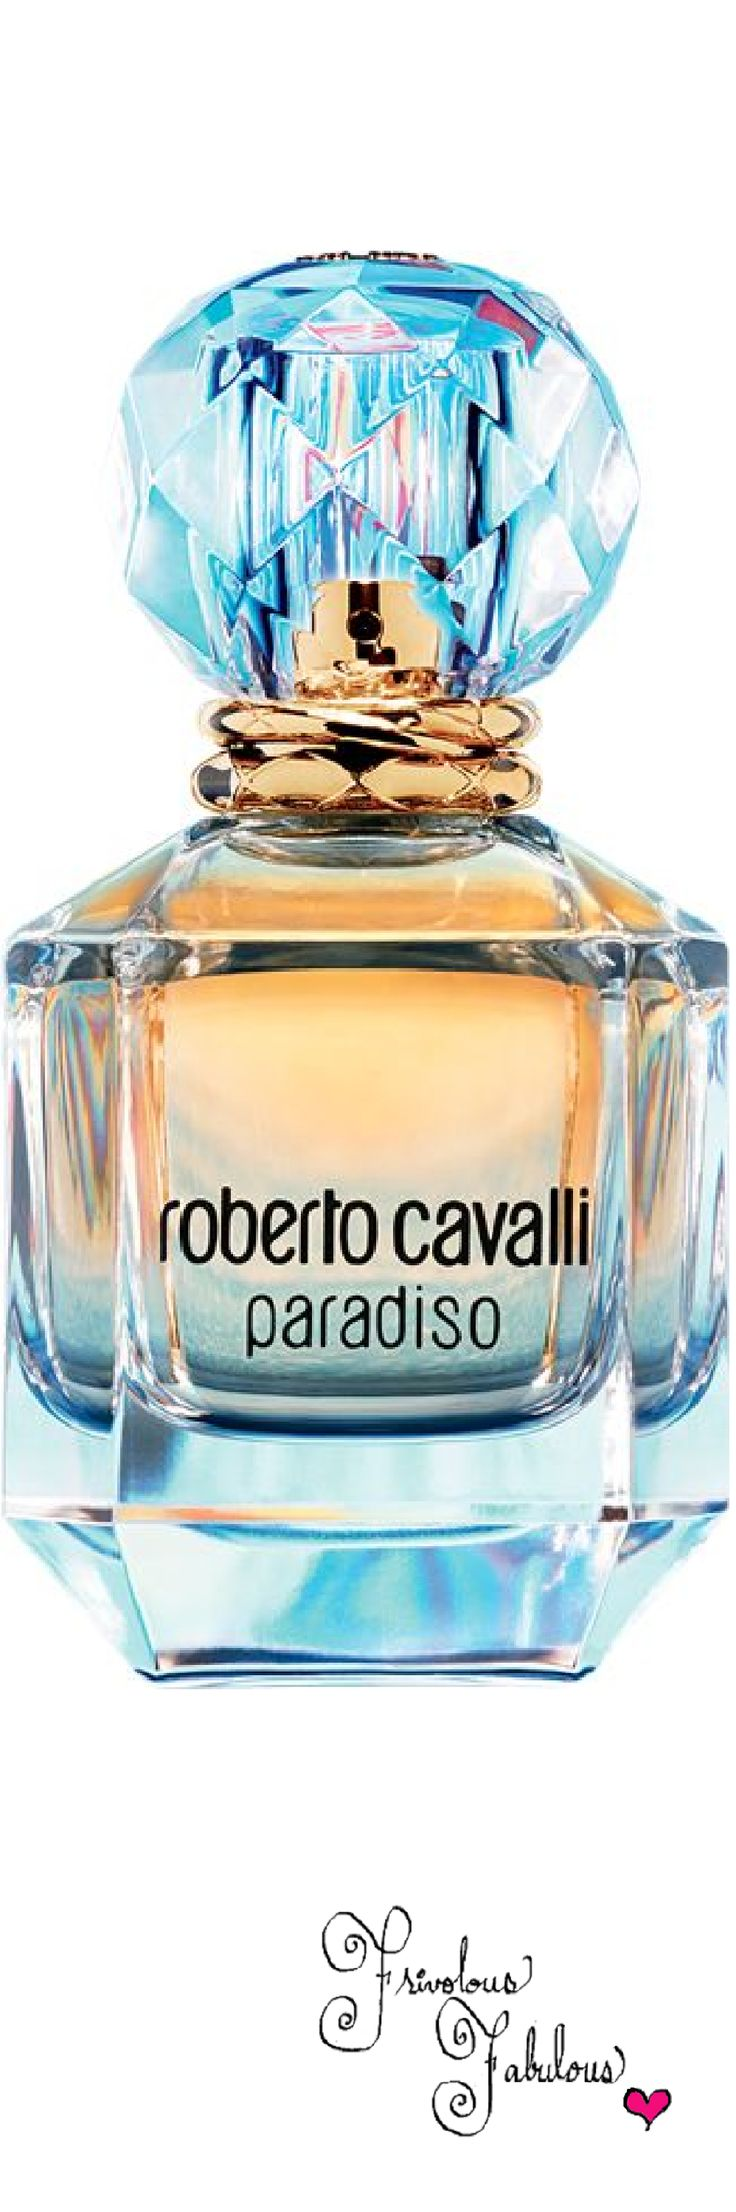 Frivolous Fabulous - Roberto Cavalli Paradiso Perfume